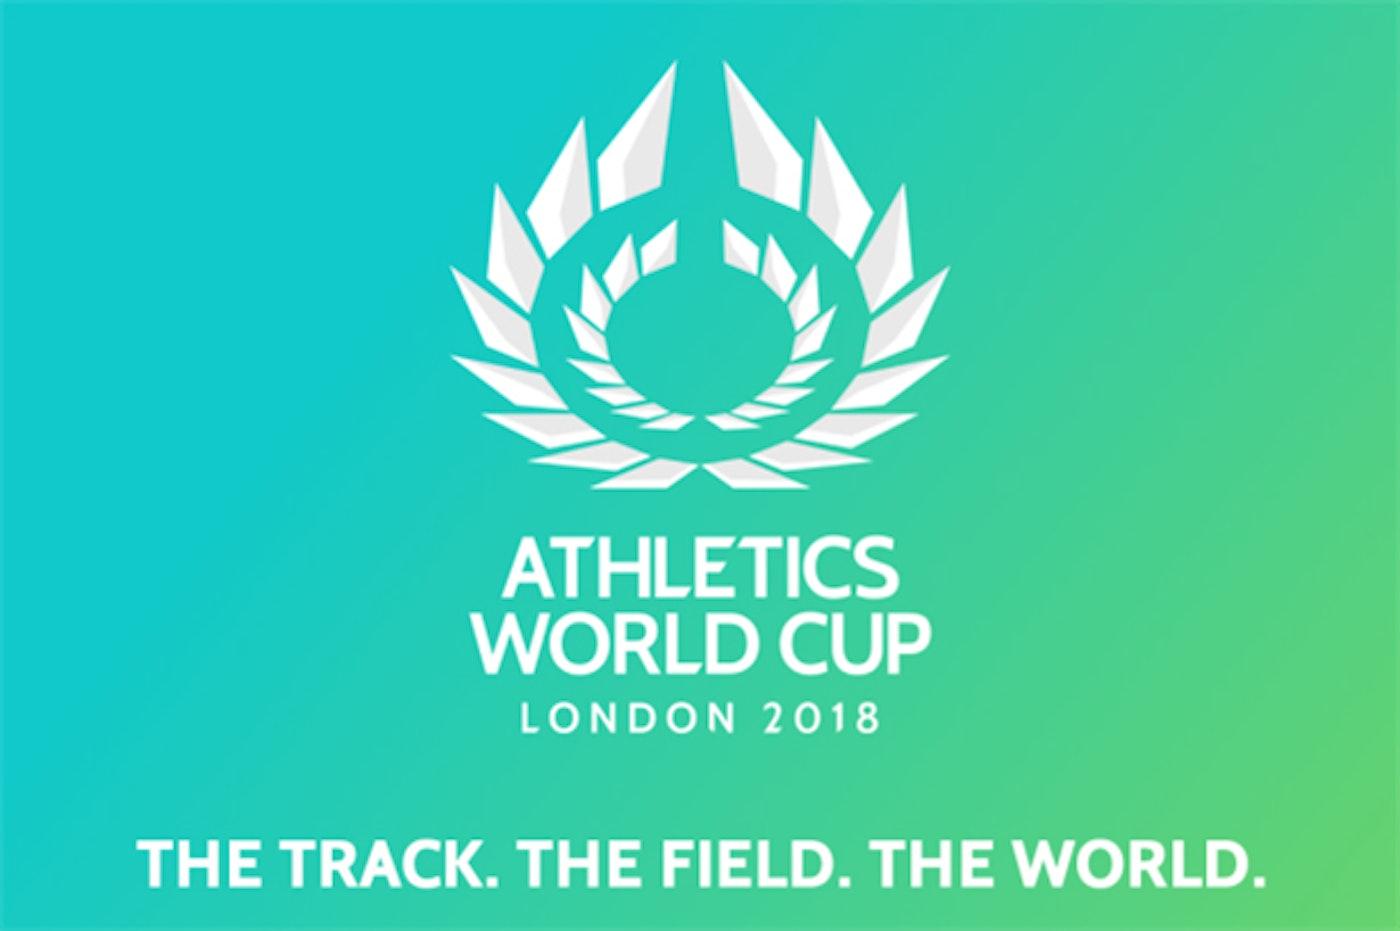 Athletics World Cup